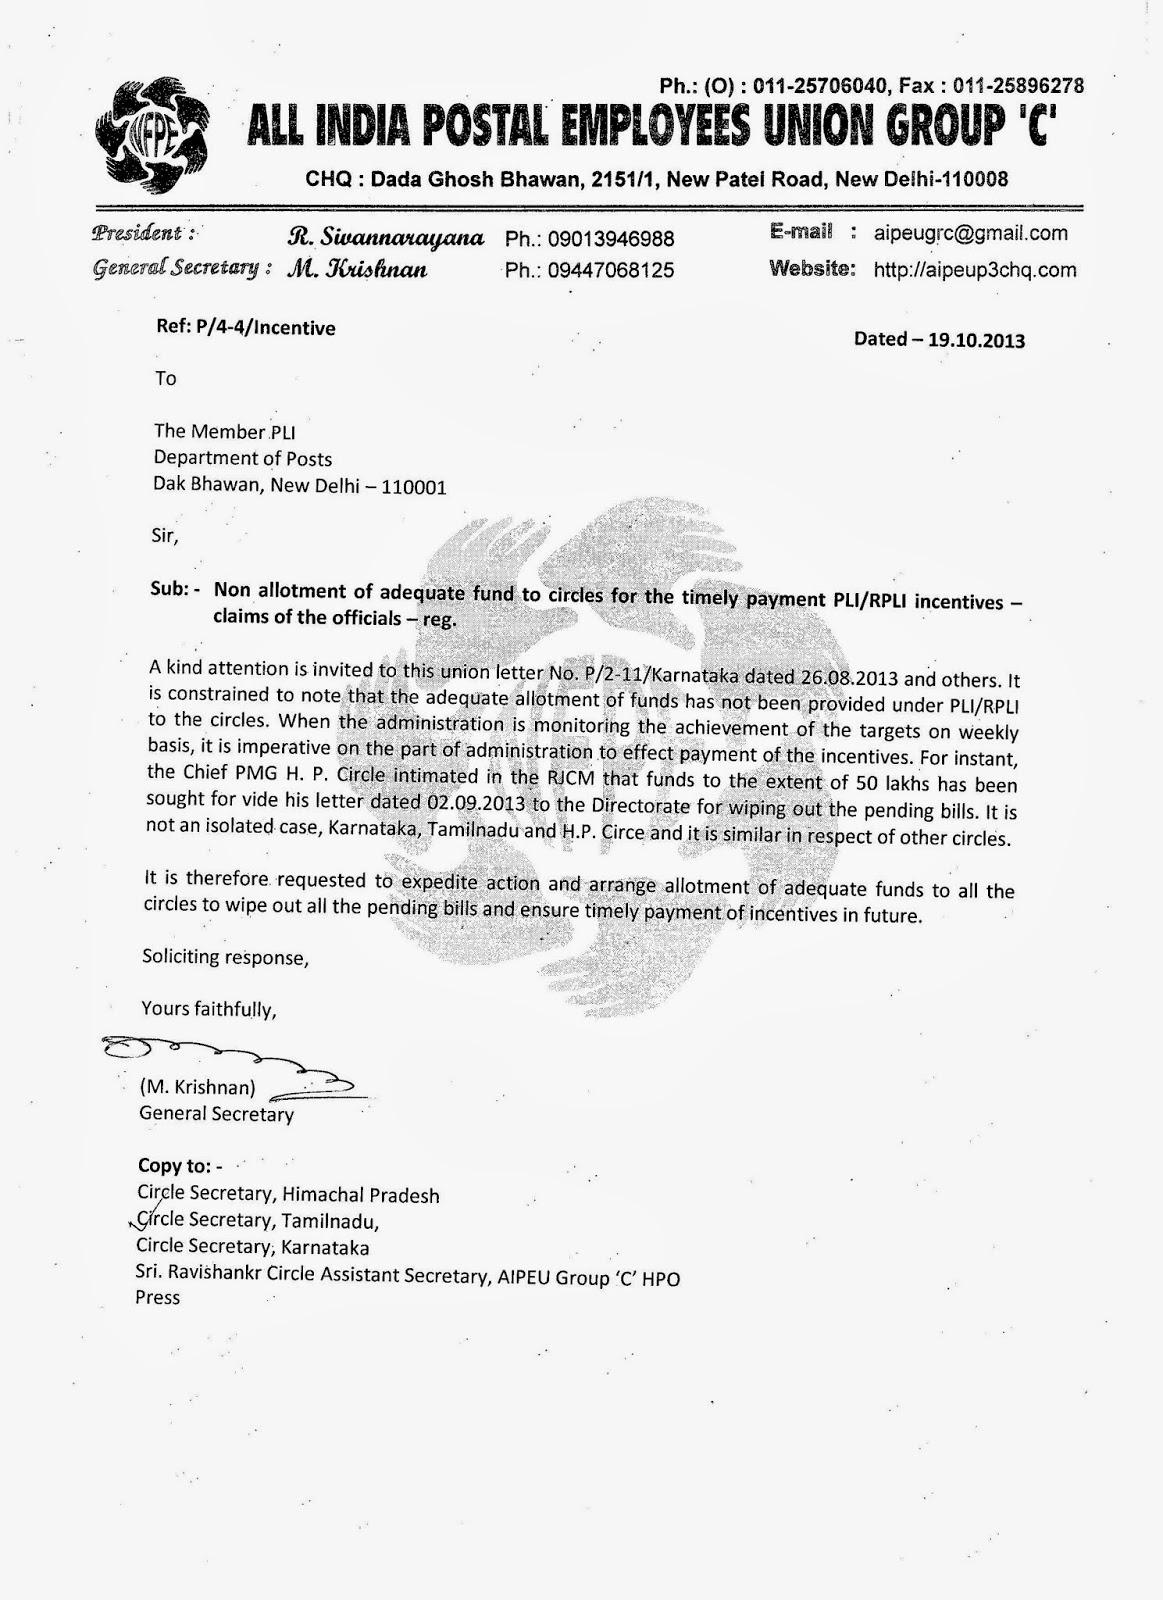 Application letter for promotion to associate professor